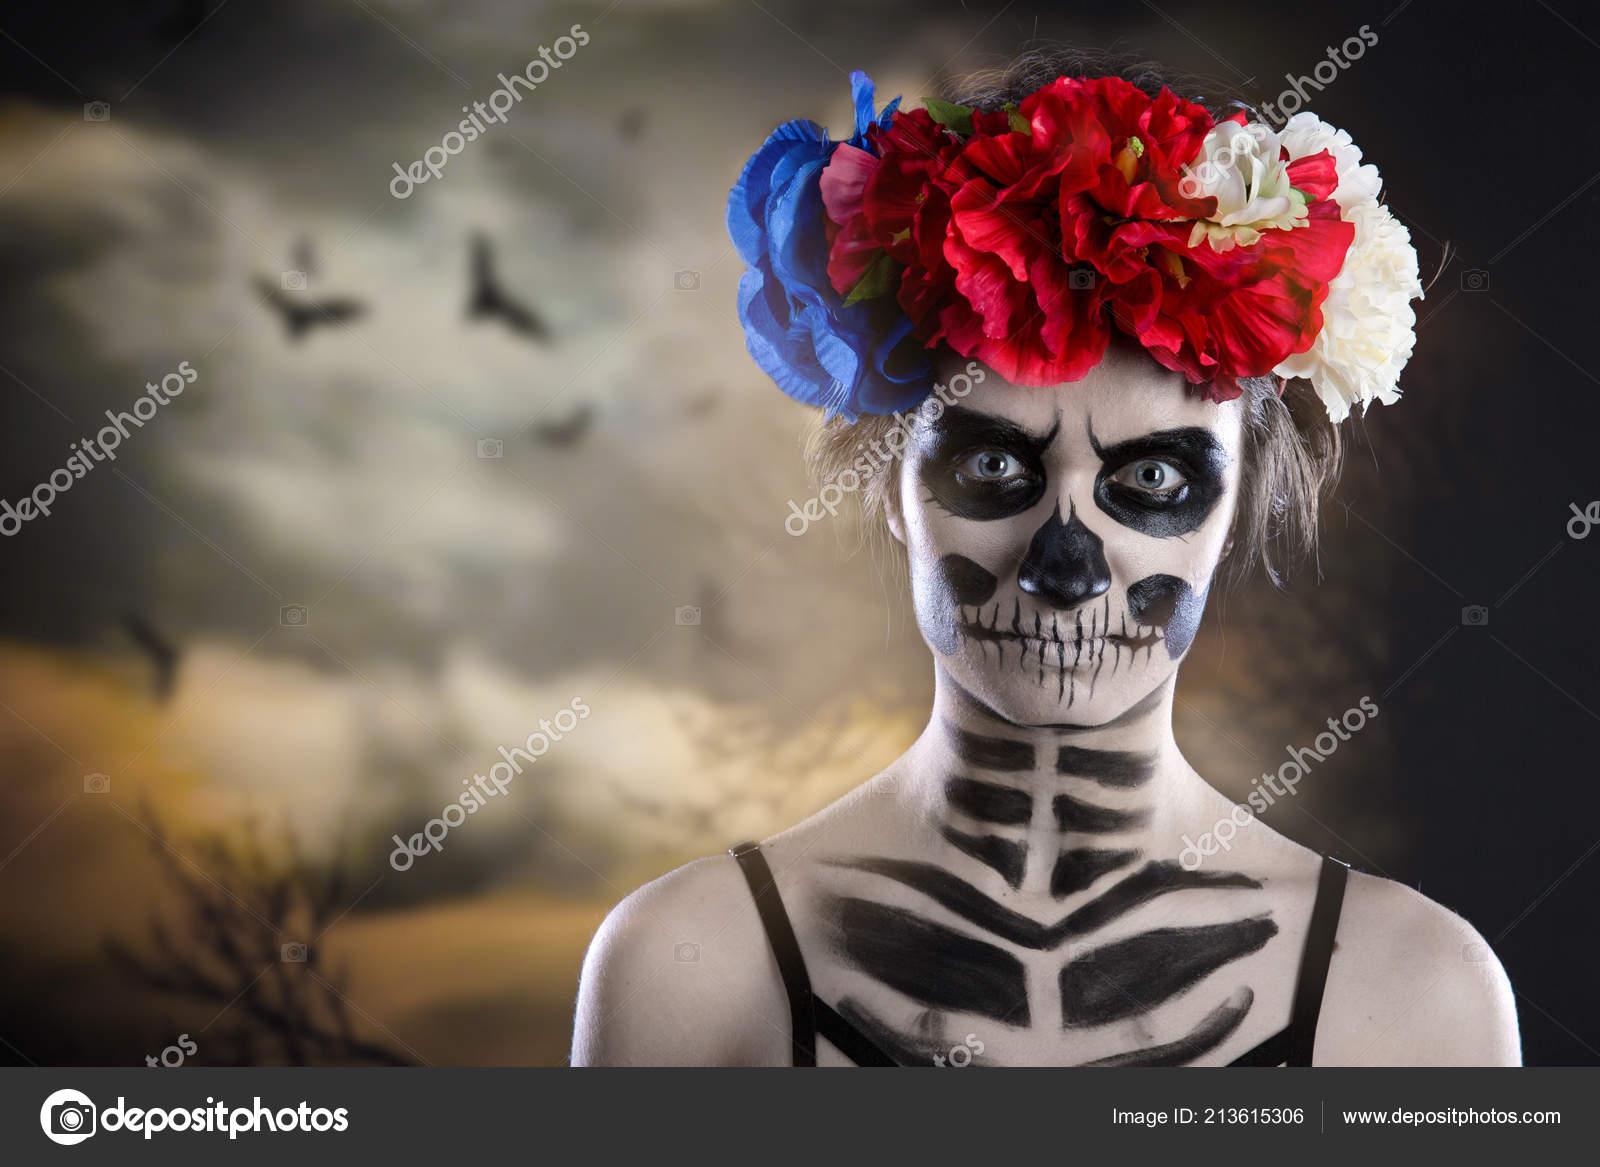 3D Female Skeleton Figure Portrait Art Home Decor Halloween Decoration 25707